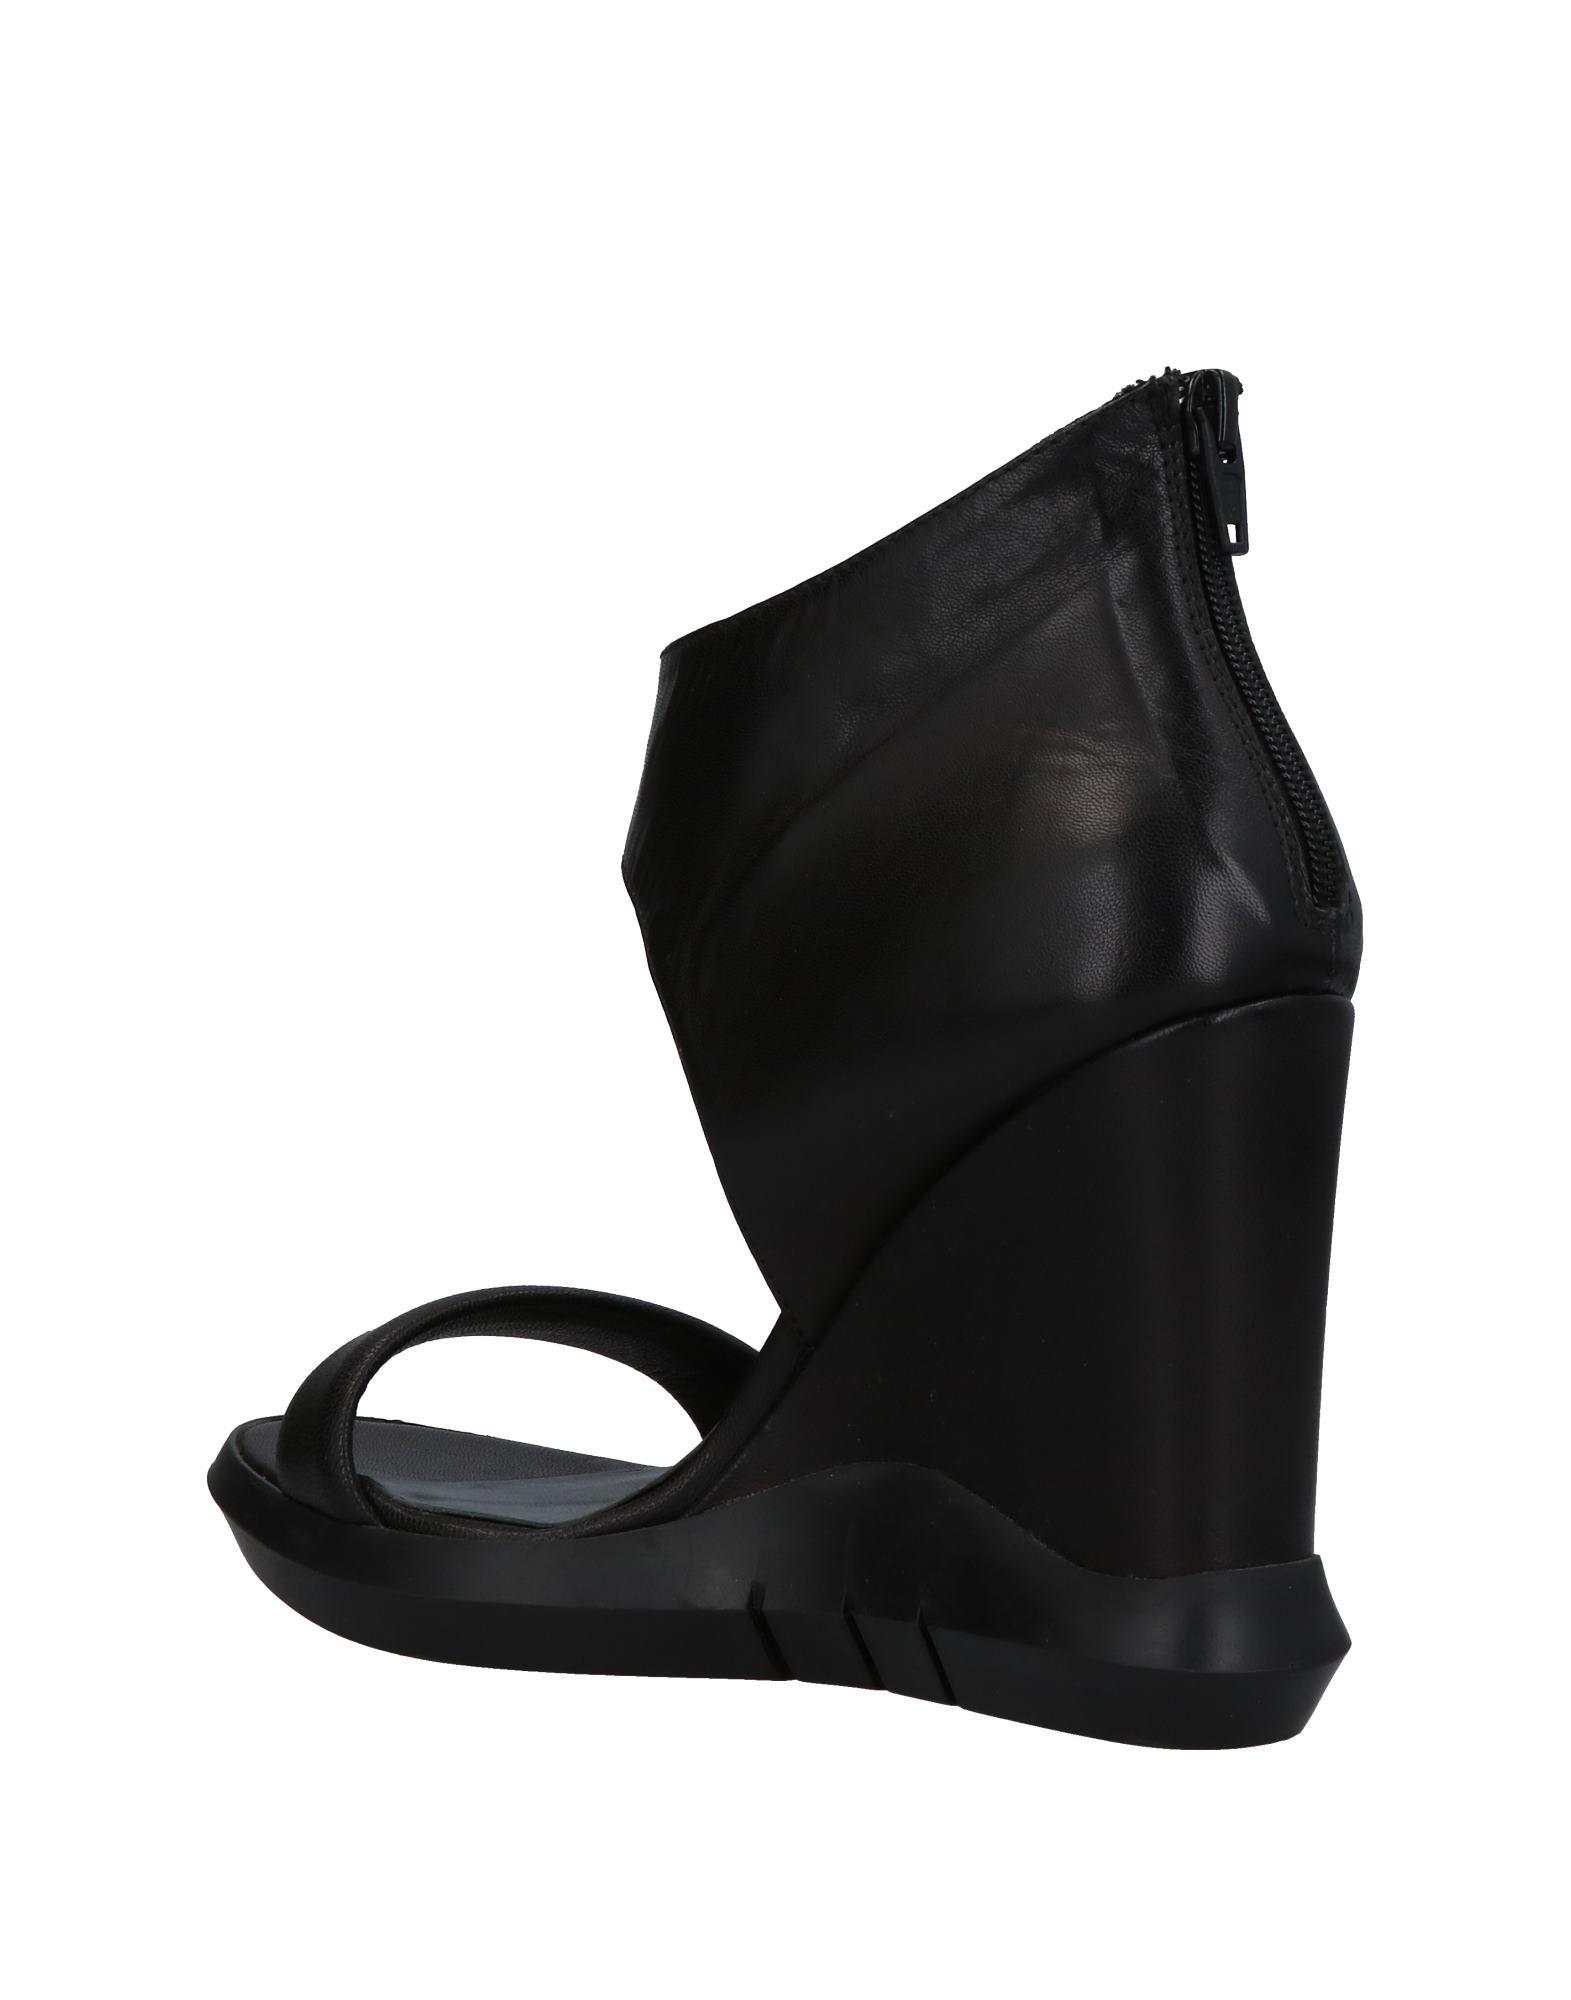 Unlace Sandalen Damen  11376617EP Gute Qualität beliebte Schuhe